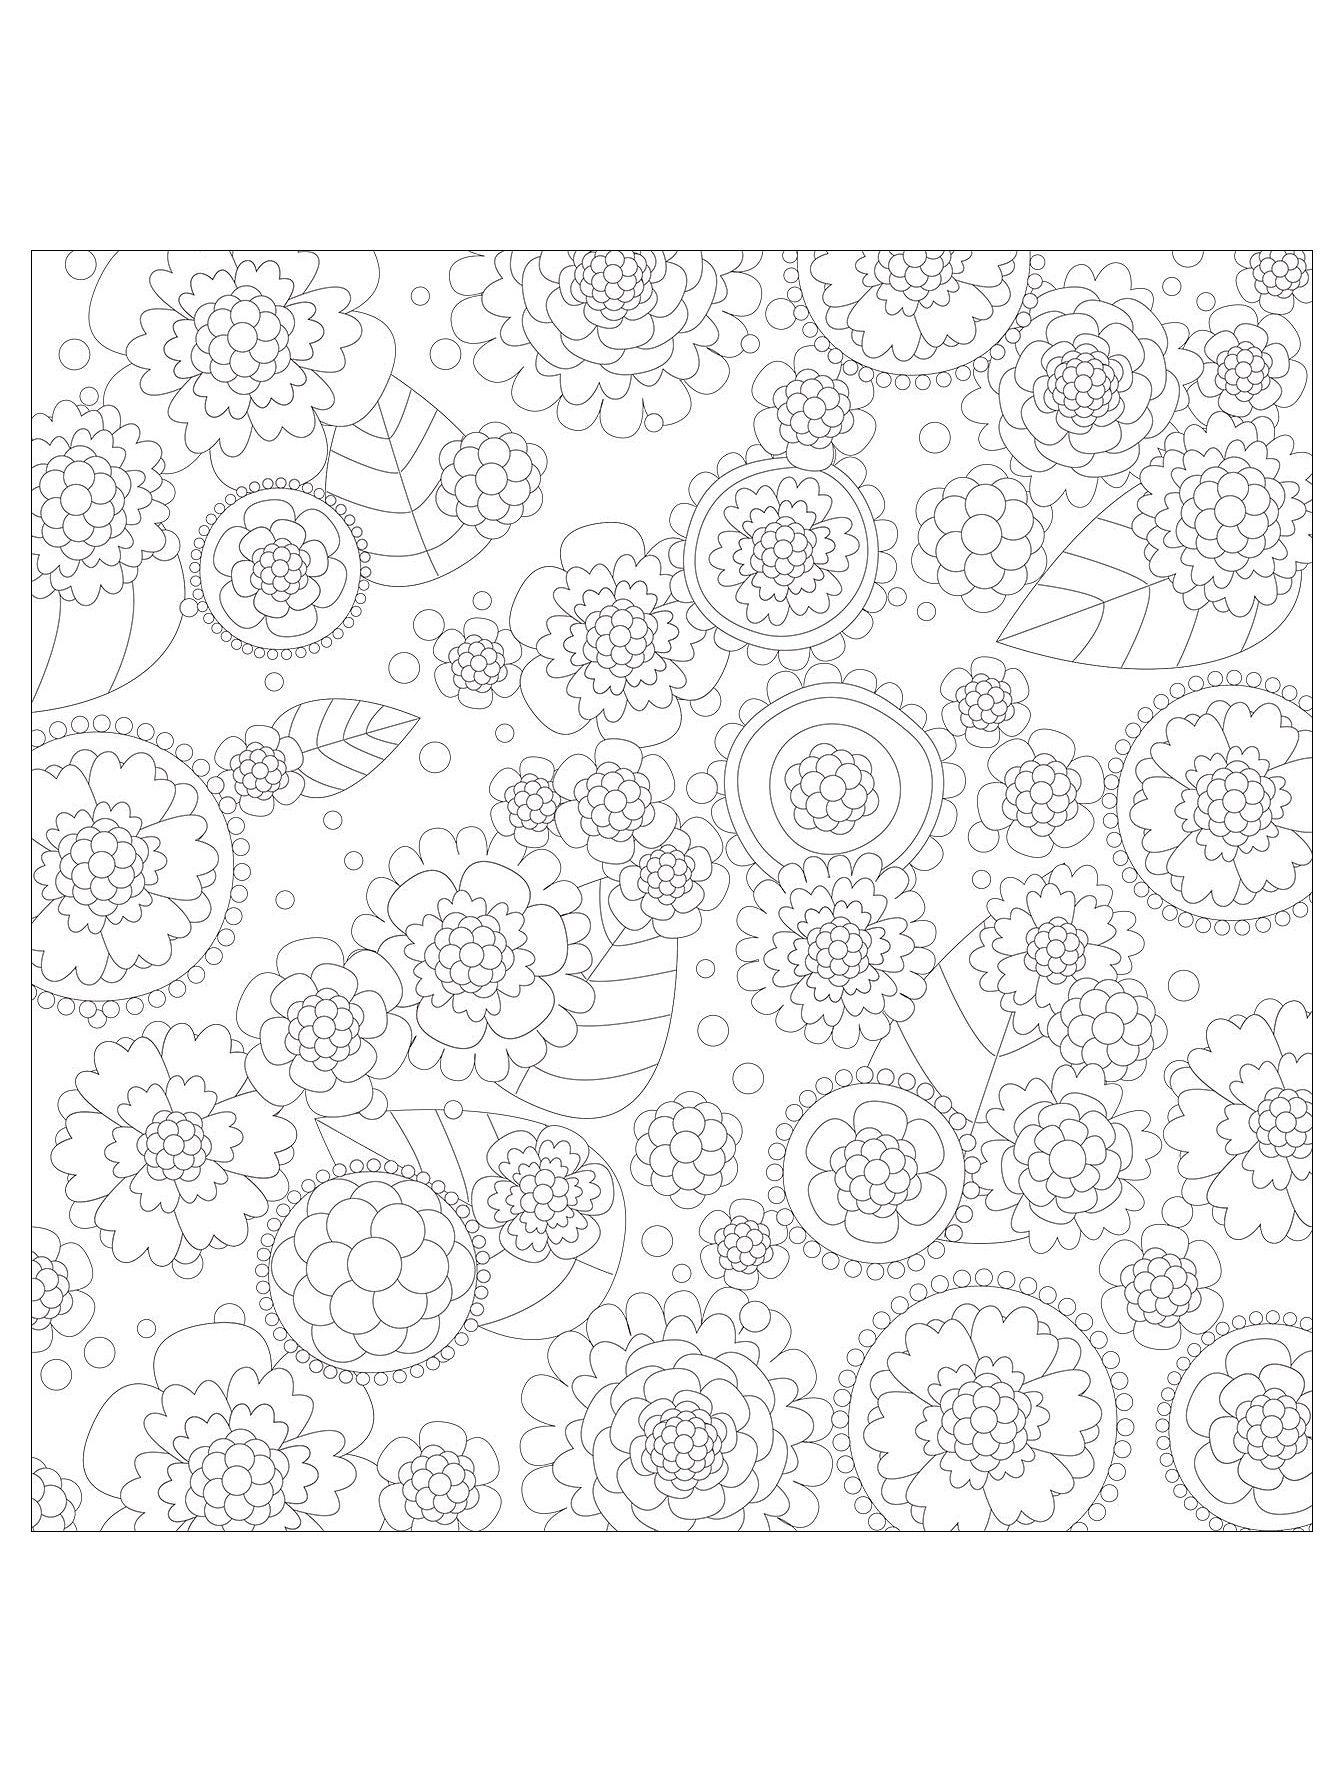 Omalovanky Pro Dospele I Creative Cz Kreativni Online Magazin A Omalovanky K Vytisknuti Creative Tapestry Decor